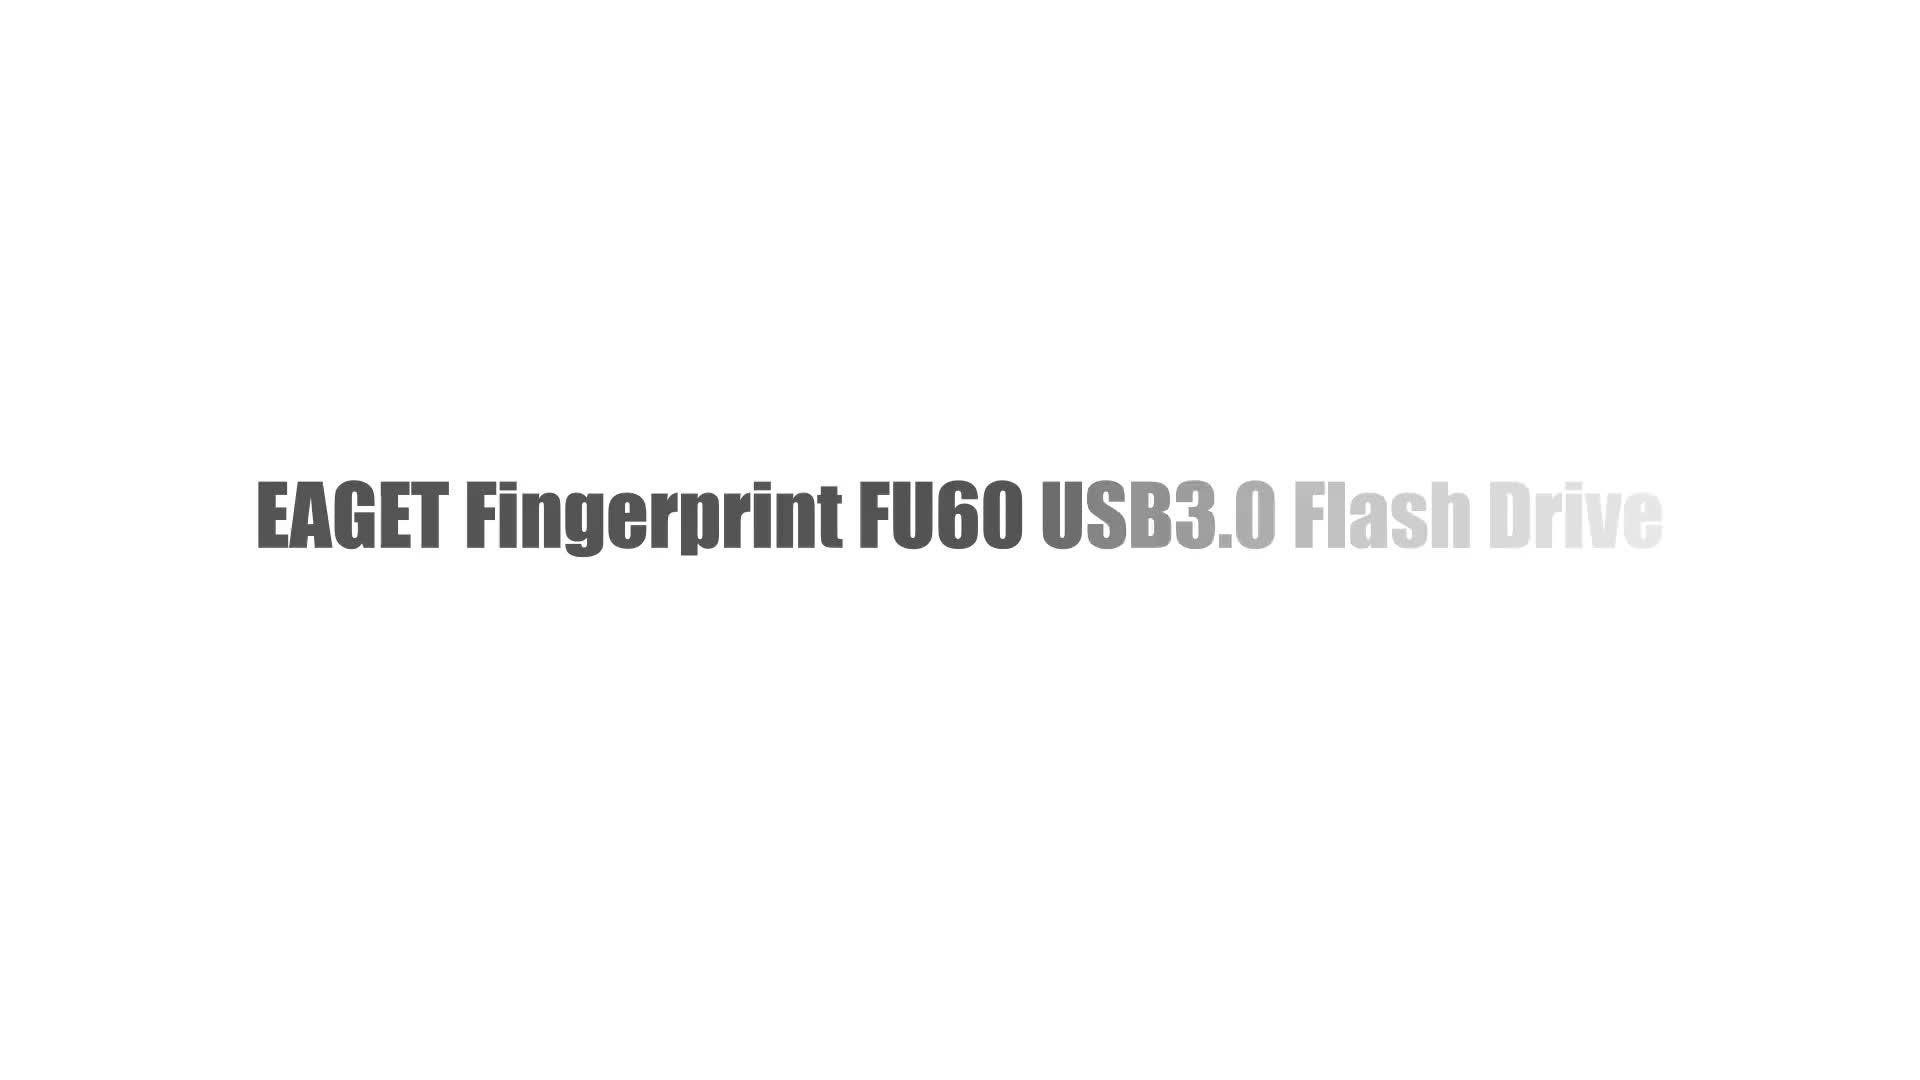 Флеш-накопитель EAGET 32 ГБ/64 Гб/128 ГБ с функцией шифрования отпечатков пальцев